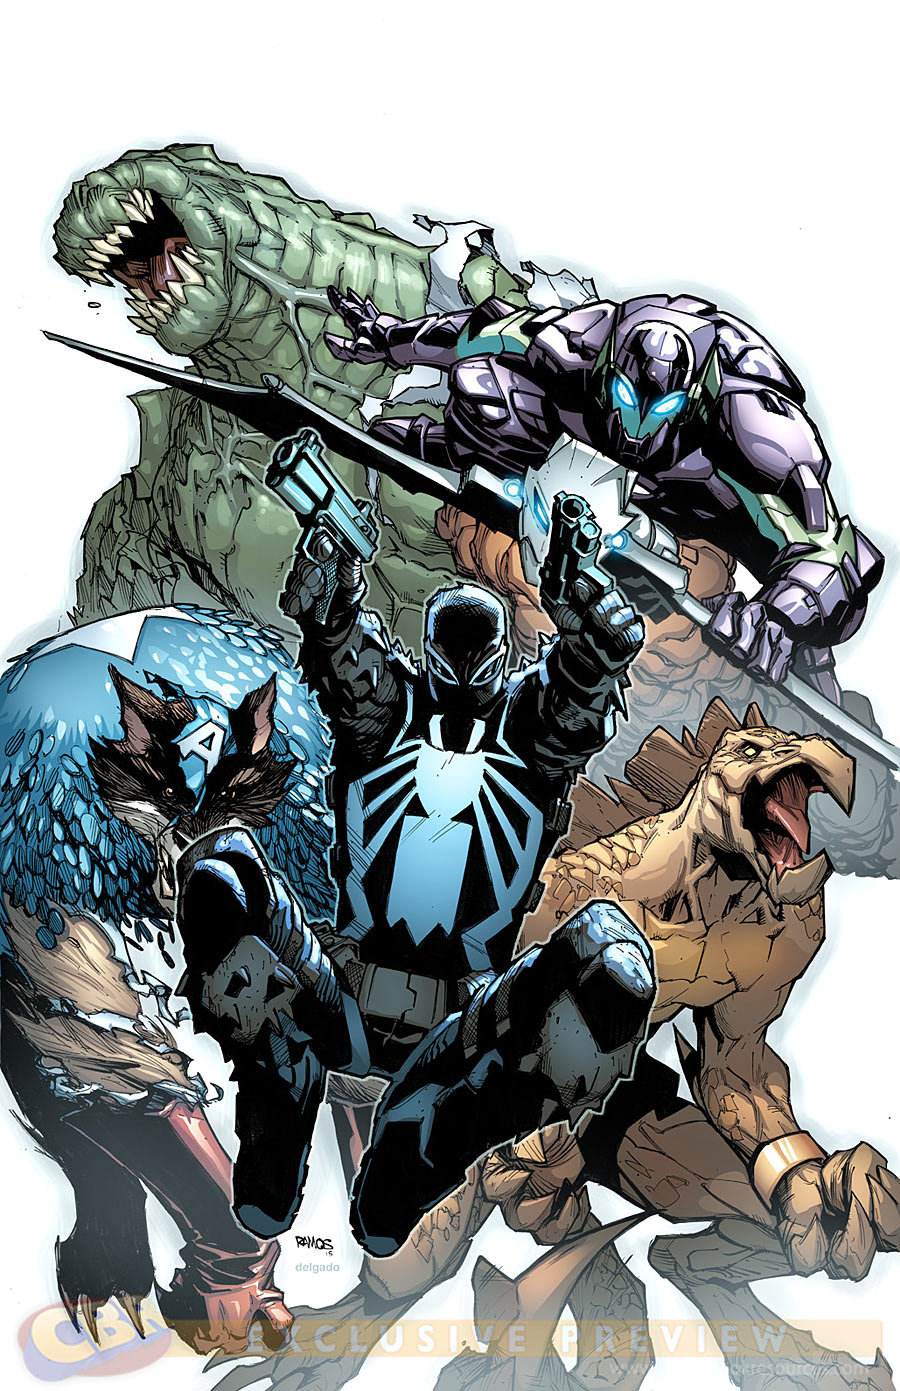 Spider-Island #2, cover